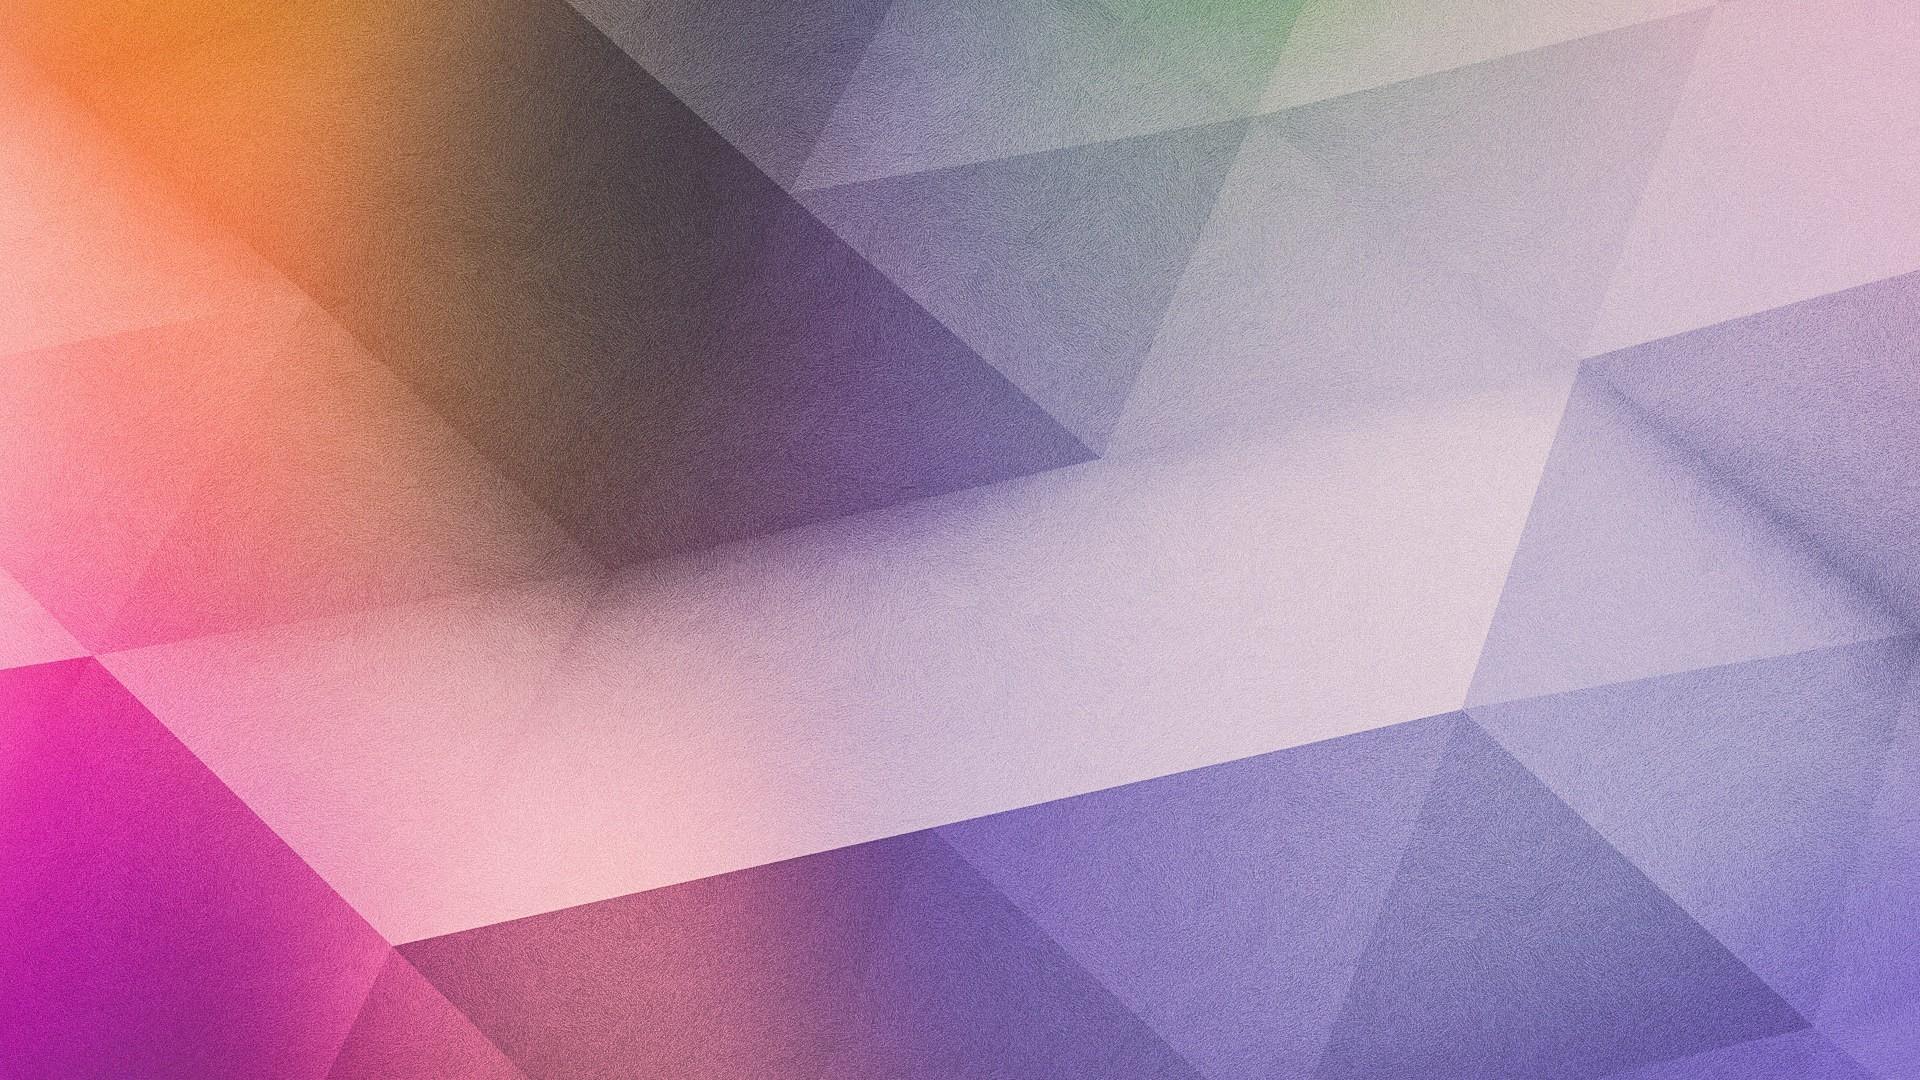 Purple Gradient Polygon HD Wallpaper High Definition Wallpaper